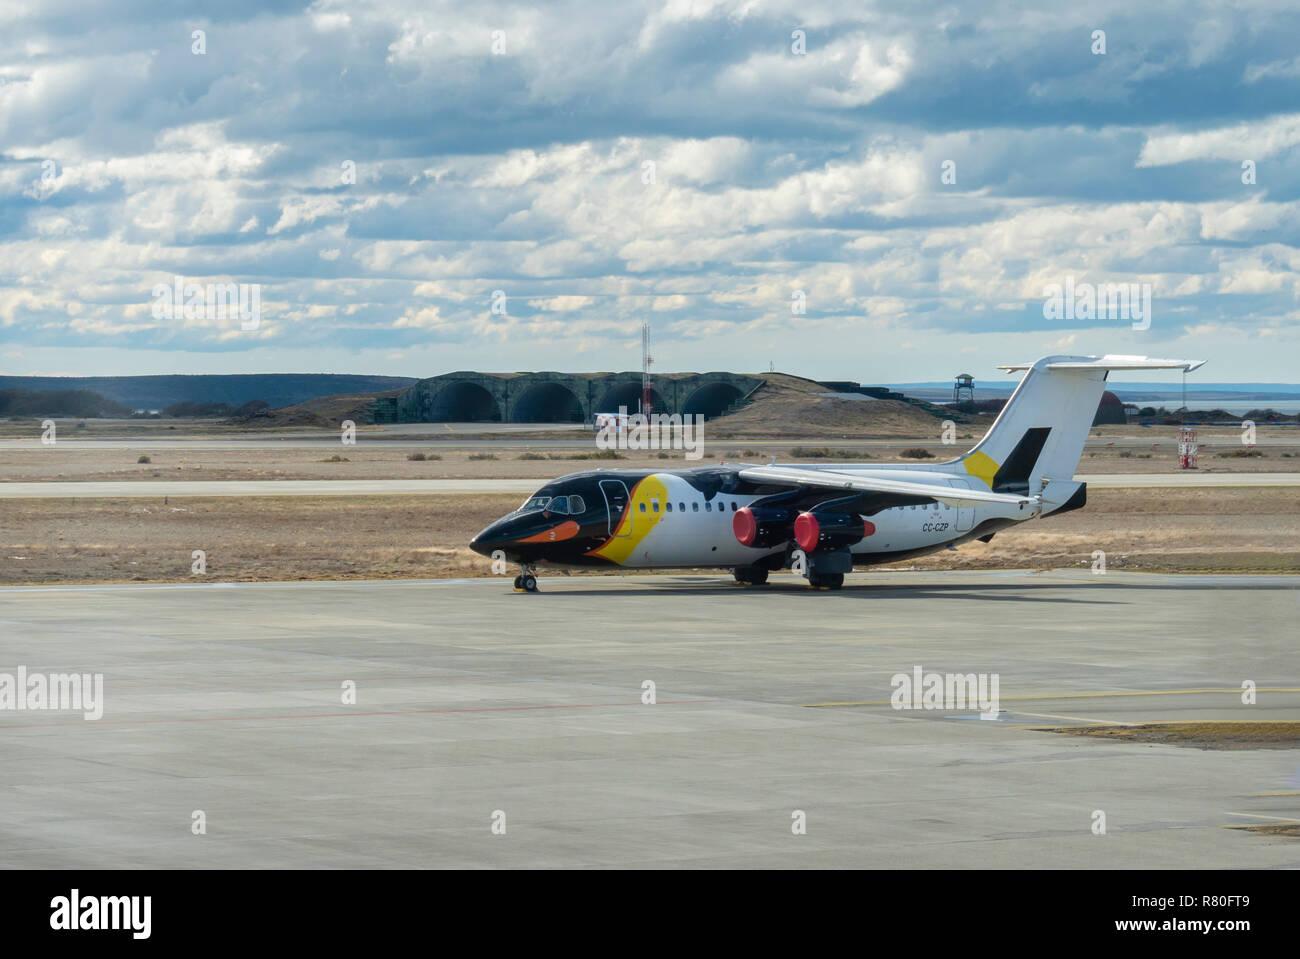 Antarctic Airways passenger airplane with penguin livery - Stock Image